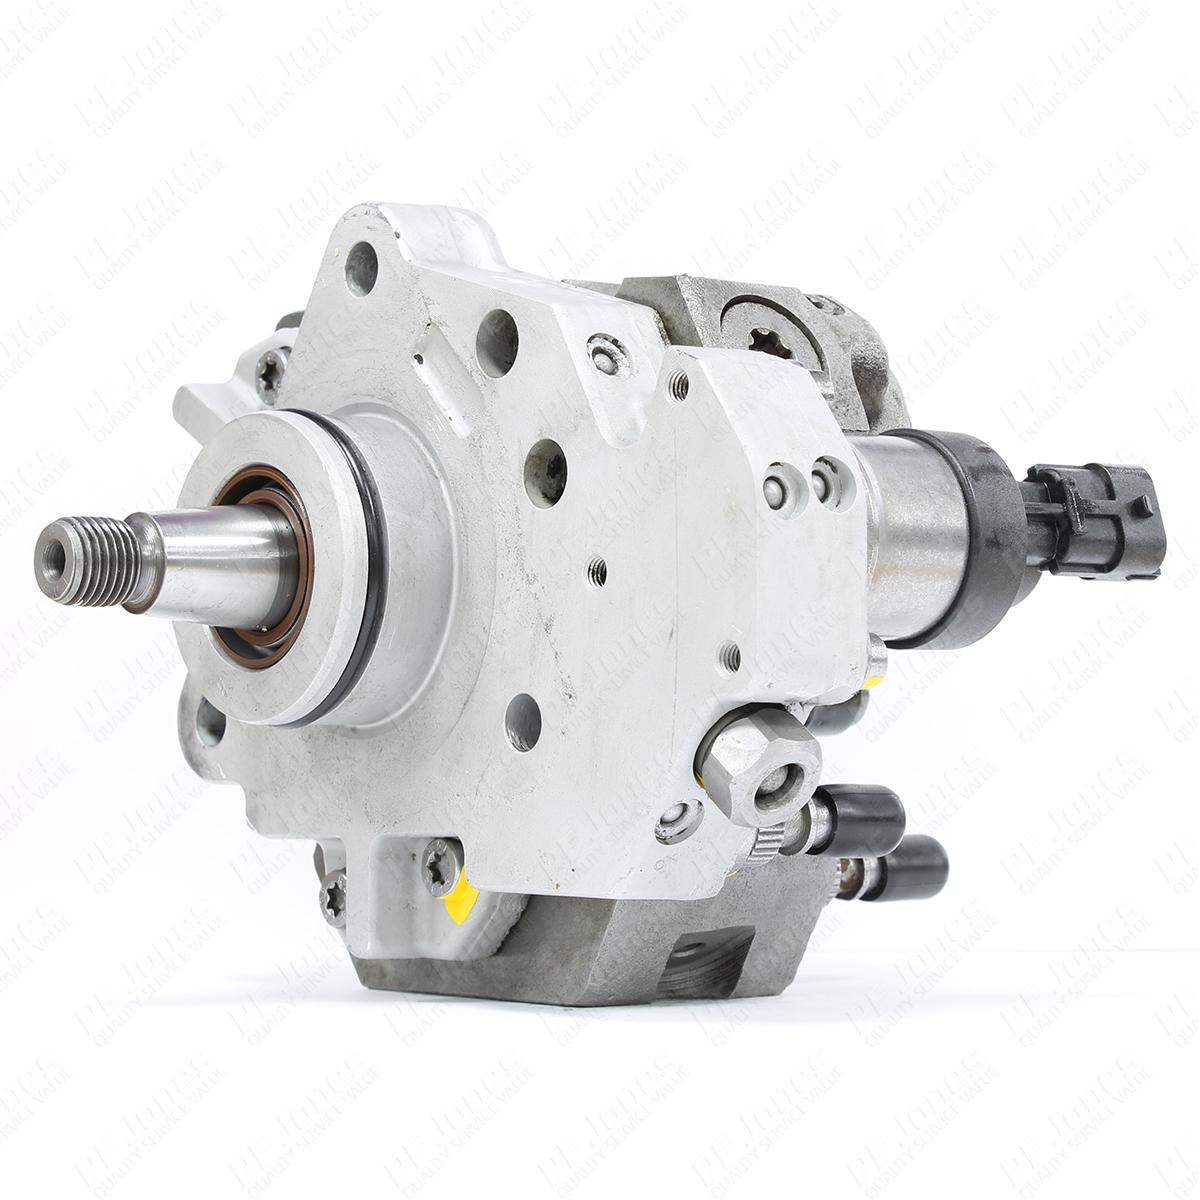 Vauxhall Vivaro 2.5 DTI/CDTI 2002-2006 Reconditioned Bosch Diesel Fuel Pump 0445010033